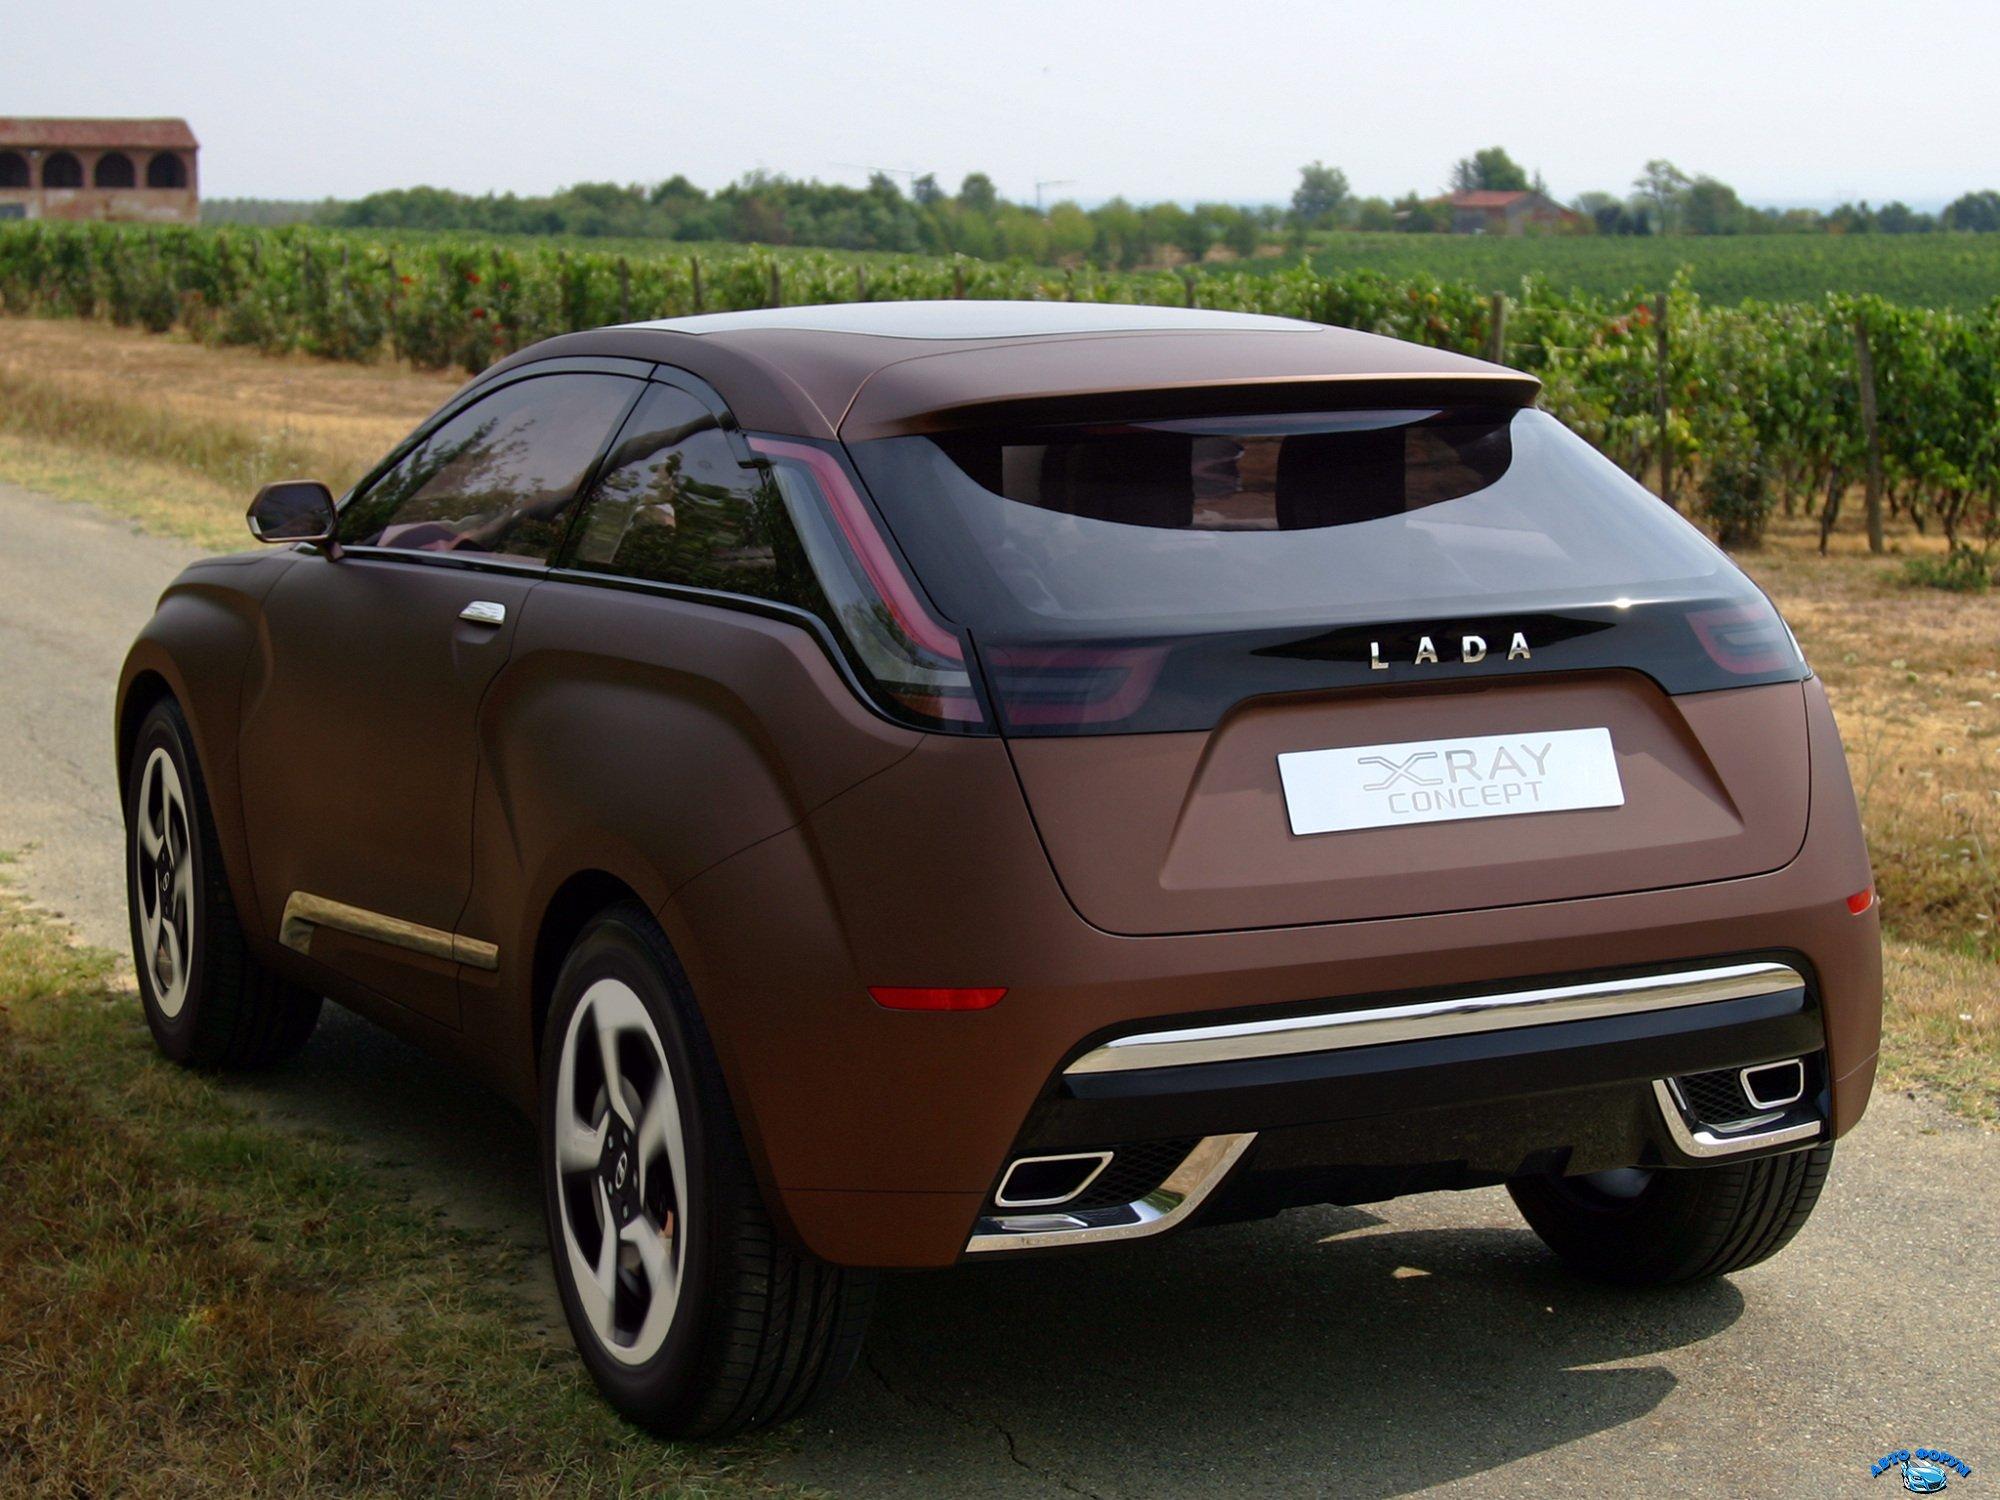 2013-lada-x-ray-concept-10.jpg